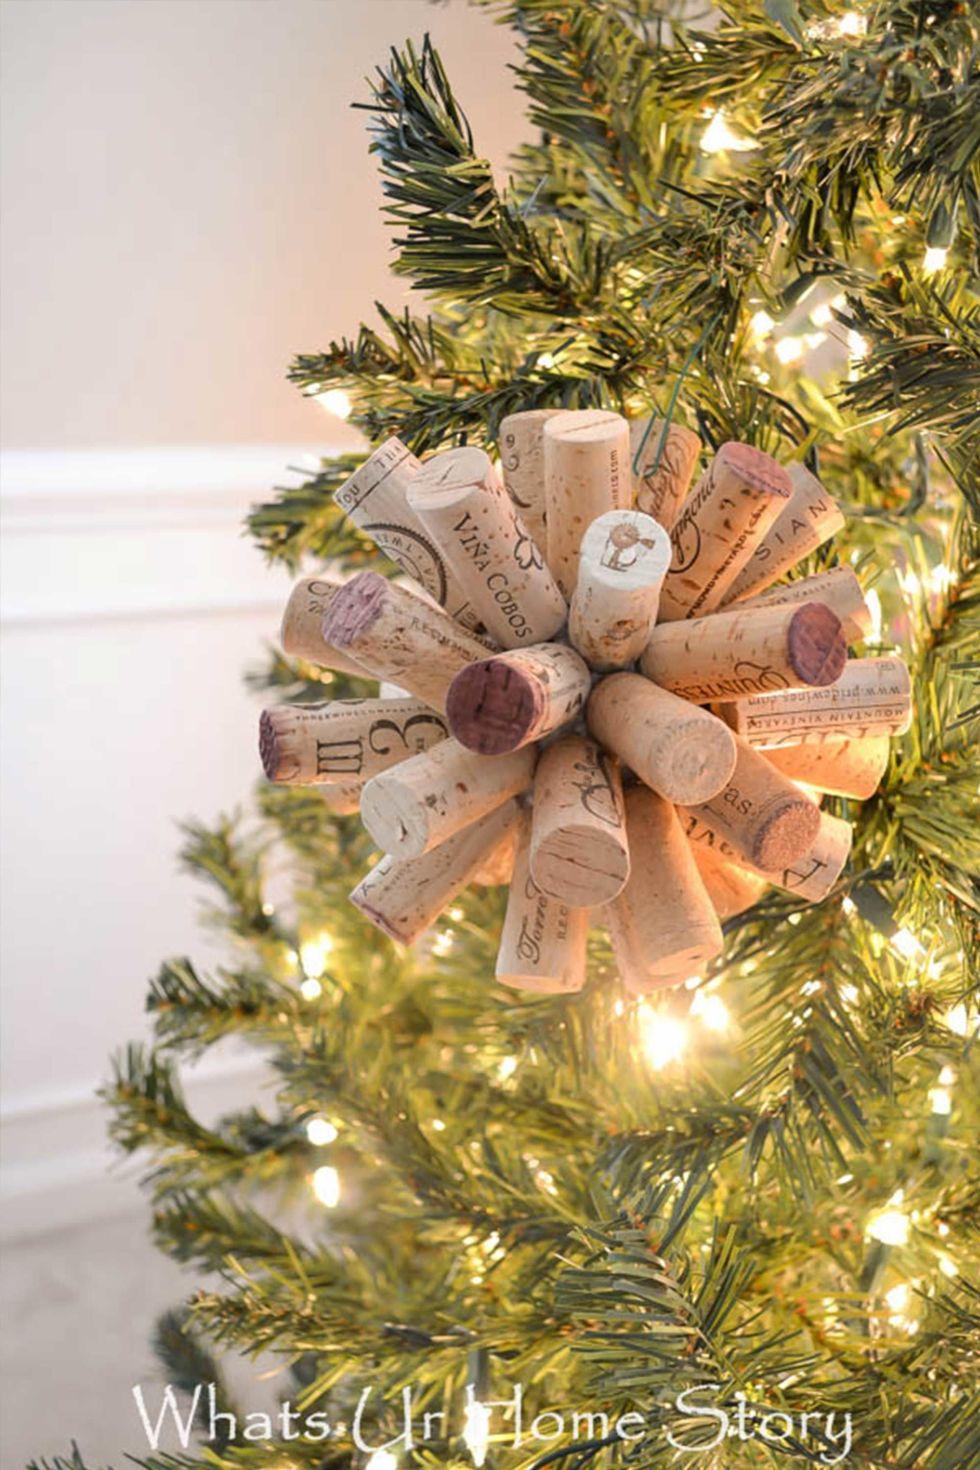 Cork christmas decorations - Cork Christmas Decorations 59